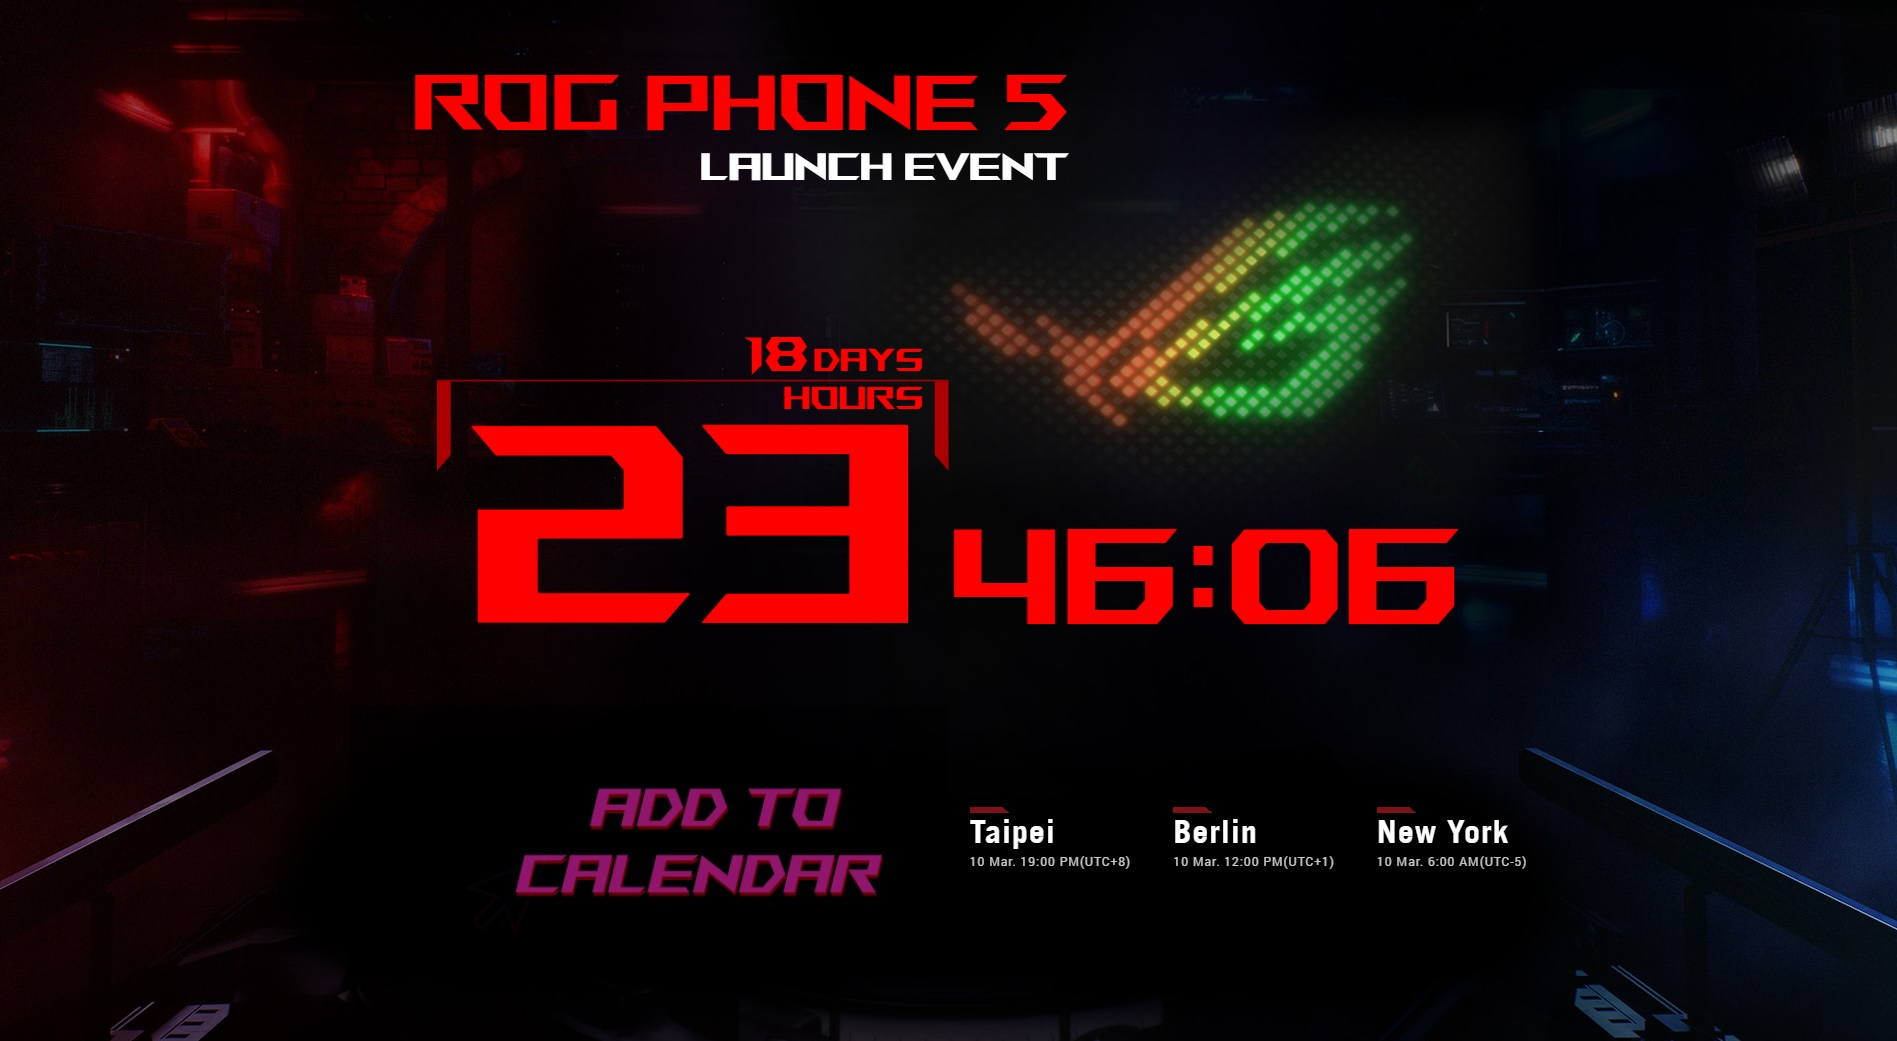 rog-phone-5-start